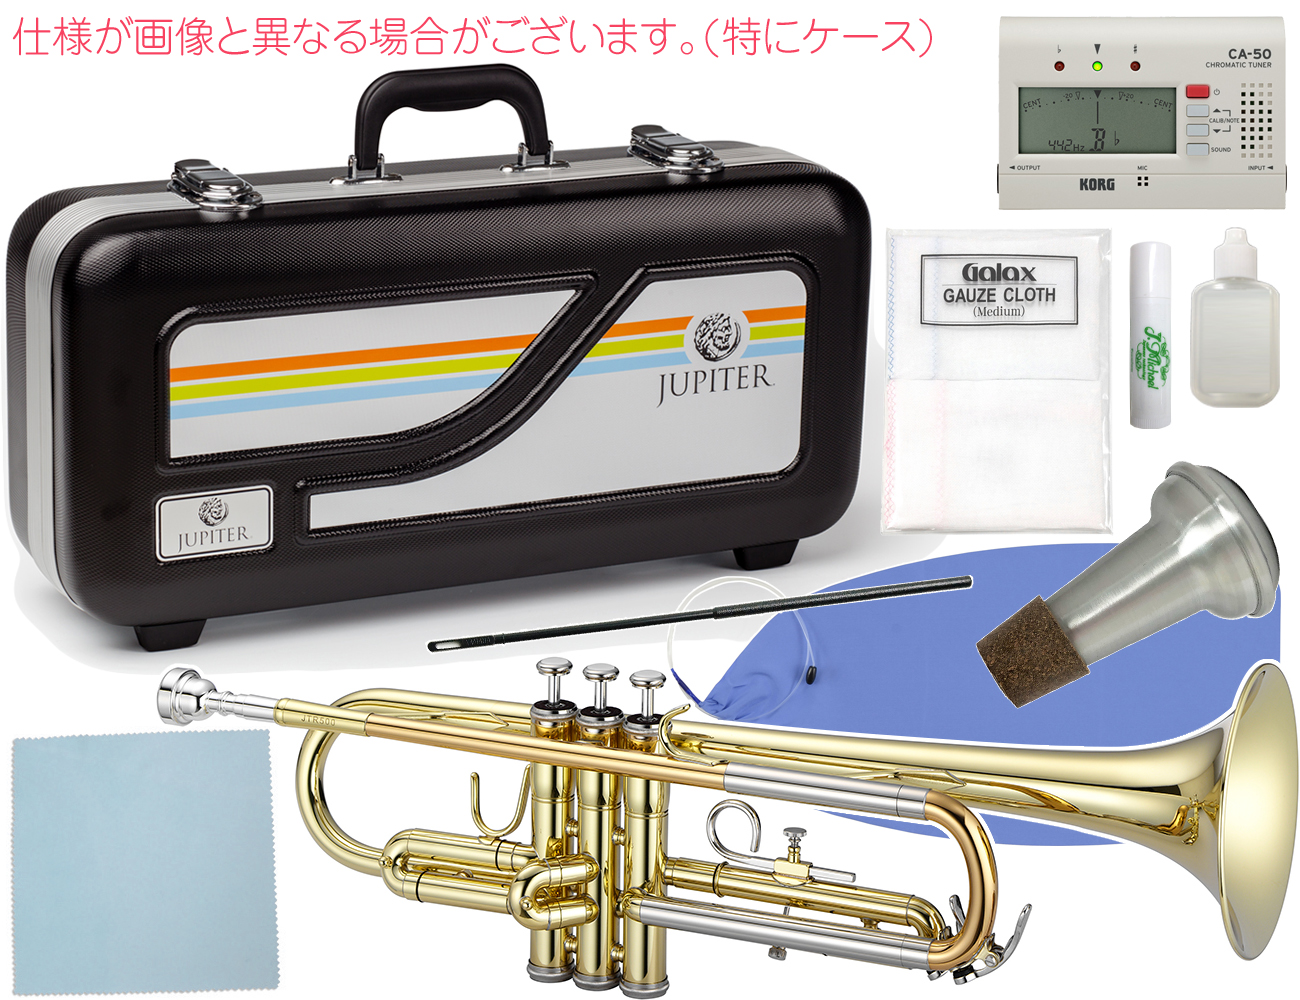 JUPITER ( ジュピター ) JTR500 トランペット 新品 ゴールド 管楽器 B♭管 スタンダード 本体 JTR-500 gold Trumpet イエローブラスベル ラッカー 楽器 セット A